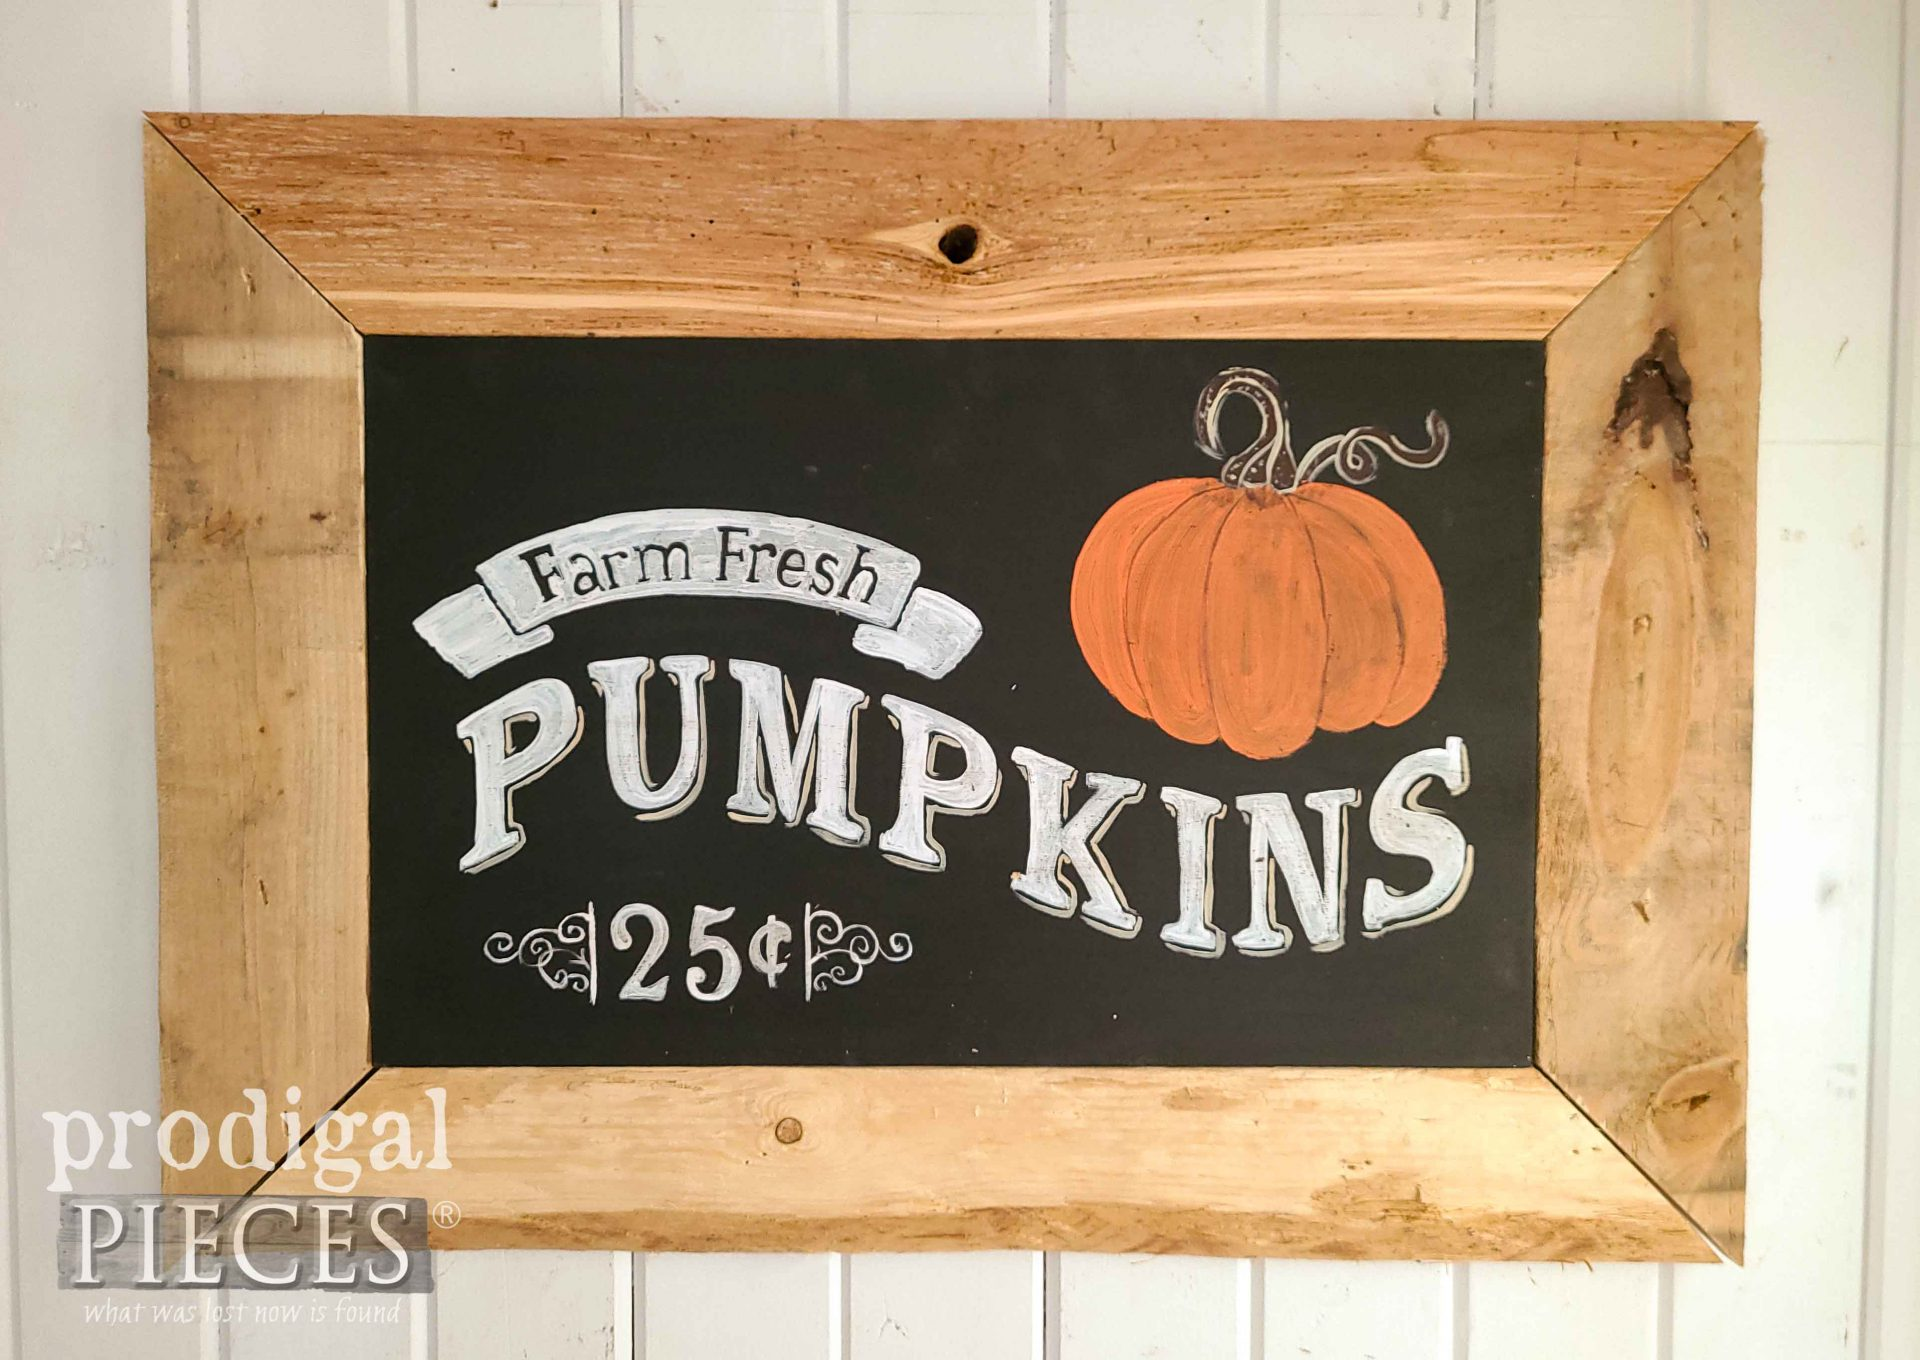 DIY Harvest Sign with Pumpkin Tutorial by Larissa of Prodigal Pieces   prodigalpieces.com #prodigalpieces #diy #farmhouse #fall #home #homedecor